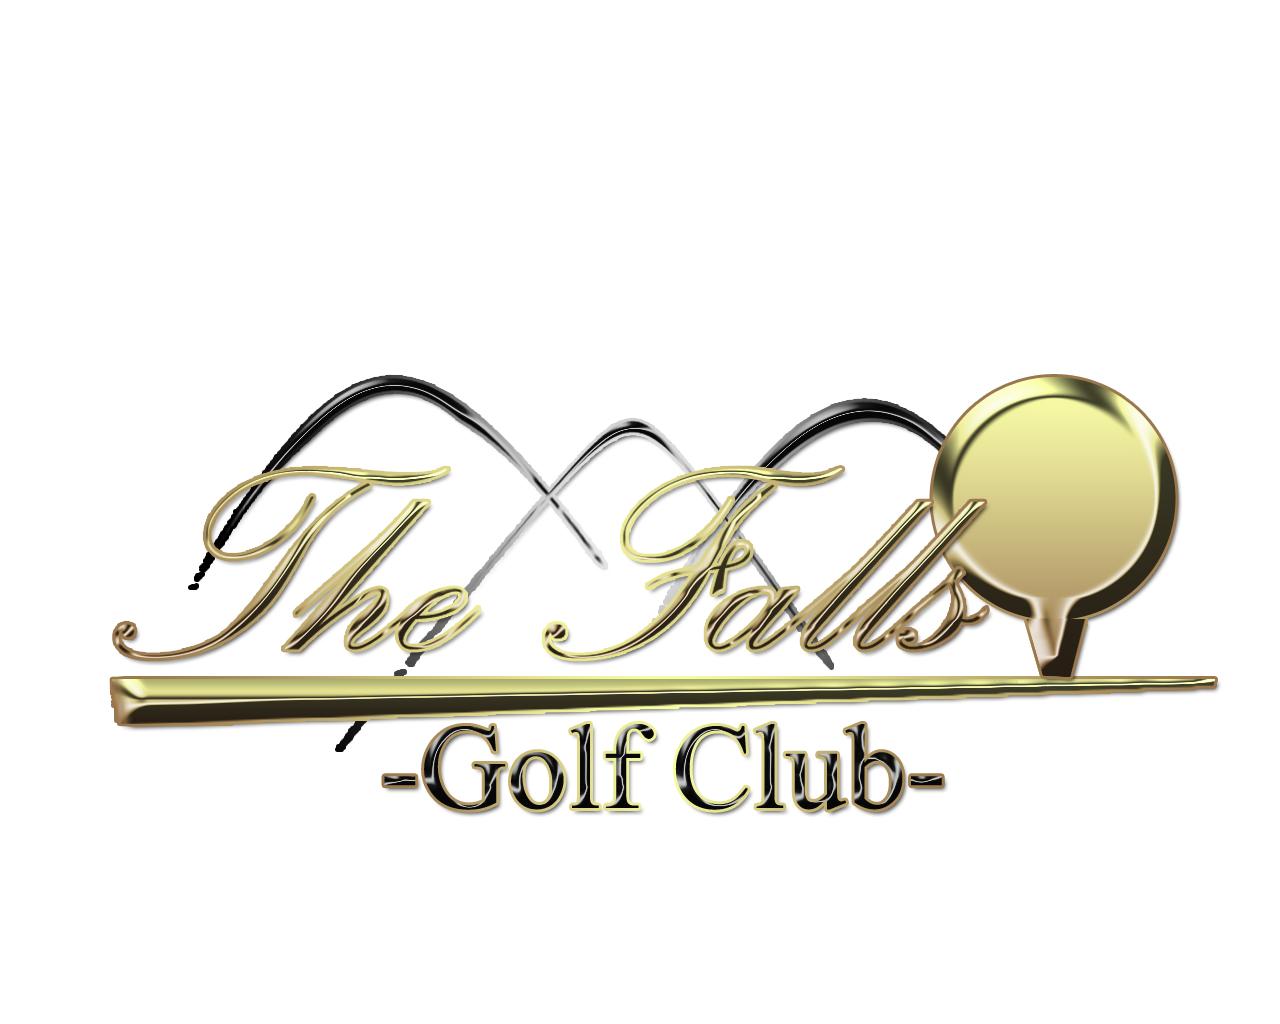 Logo Design by Mythos Designs - Entry No. 111 in the Logo Design Contest The Falls Golf Club Logo Design.